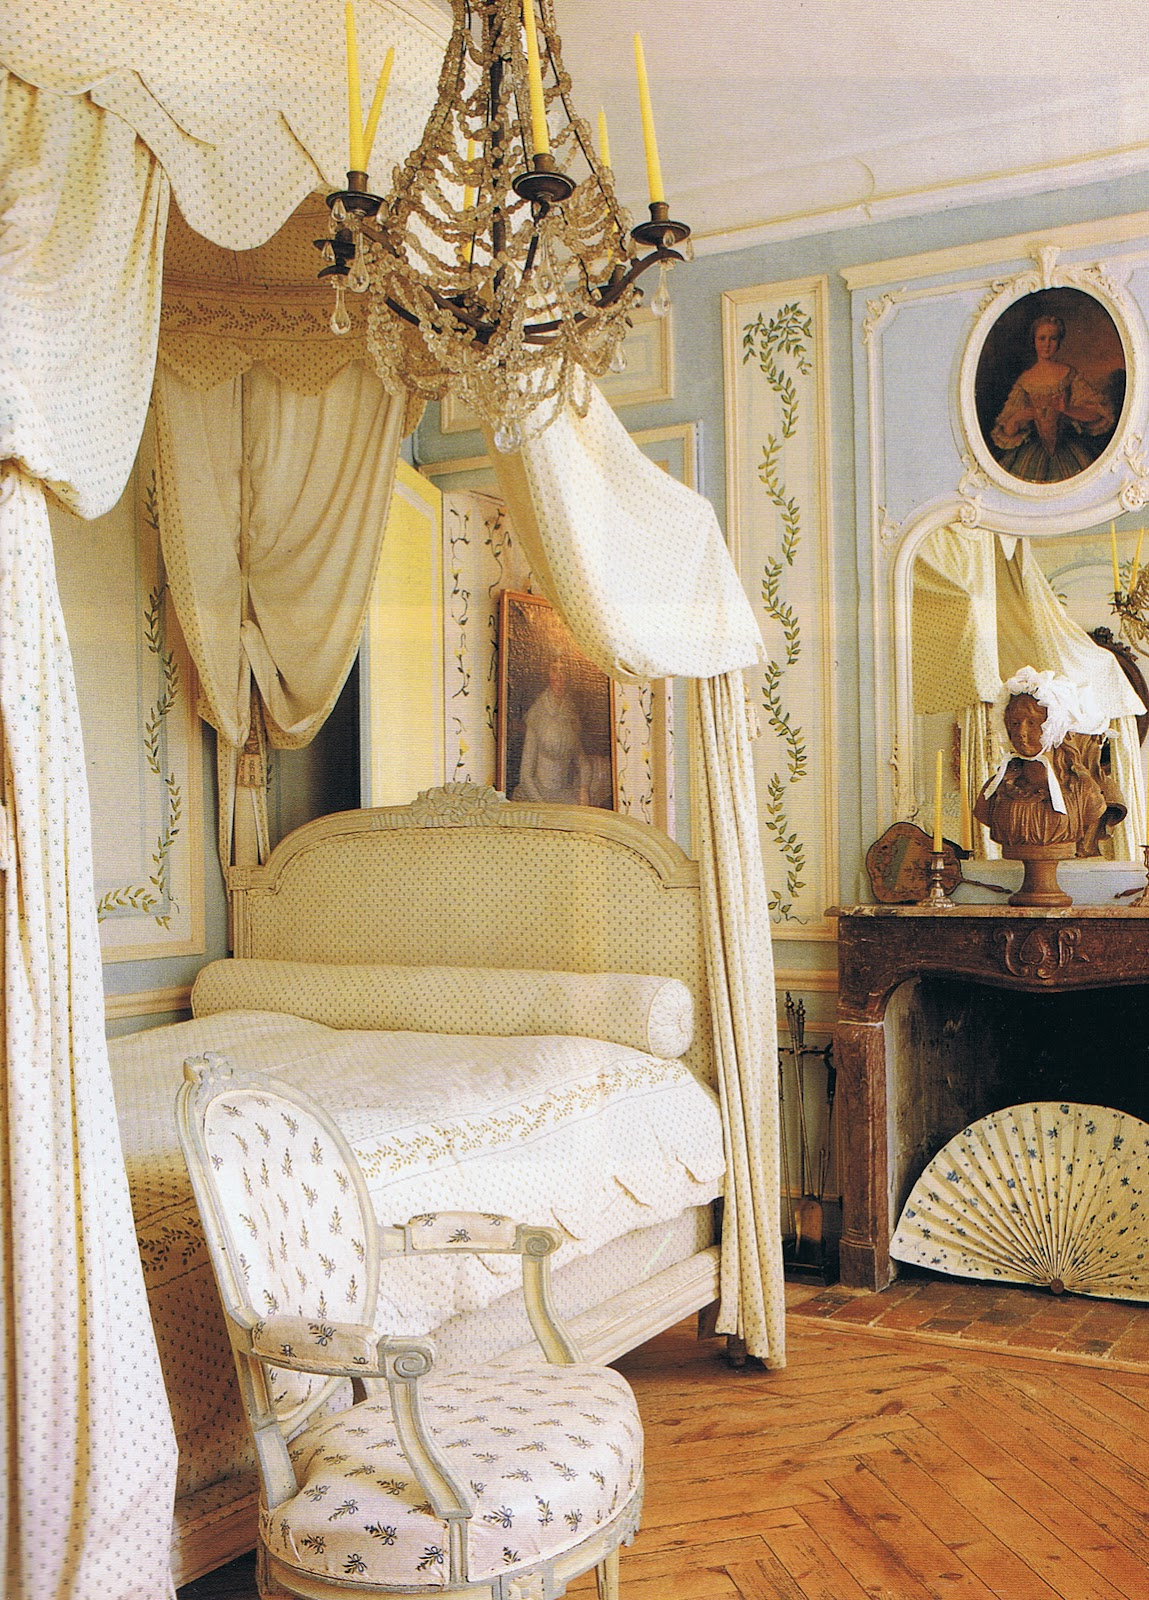 Bedroom Chair M&s Revolving Under 3000 Loveisspeed Chateau De Morsan Normandy France